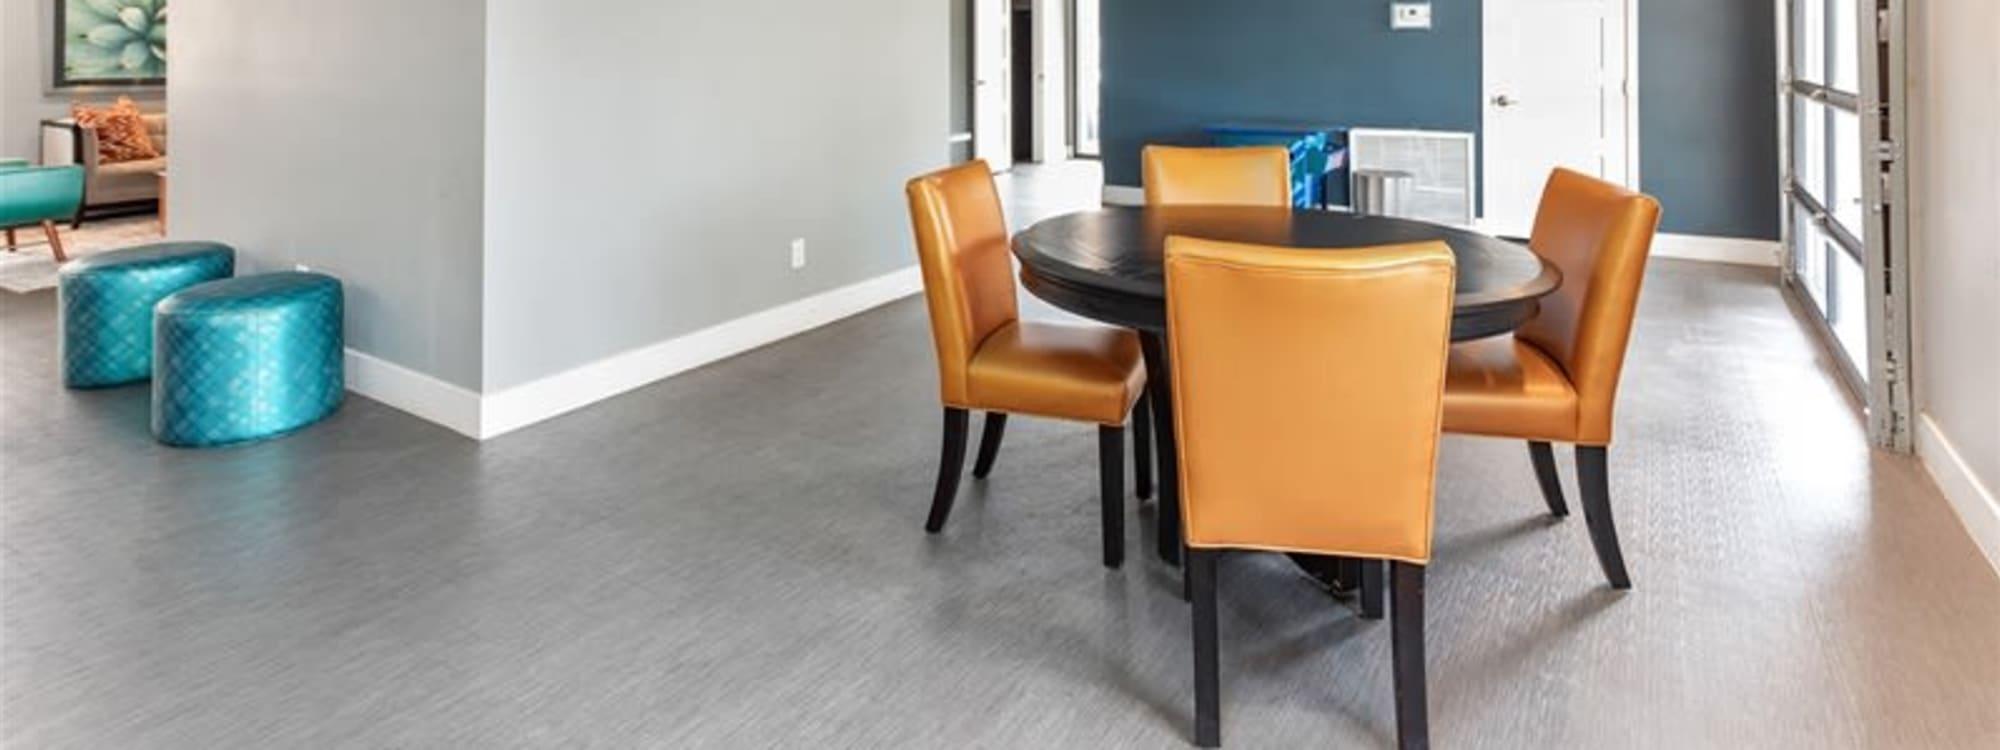 Contact Argenta Apartments in Mesa, Arizona